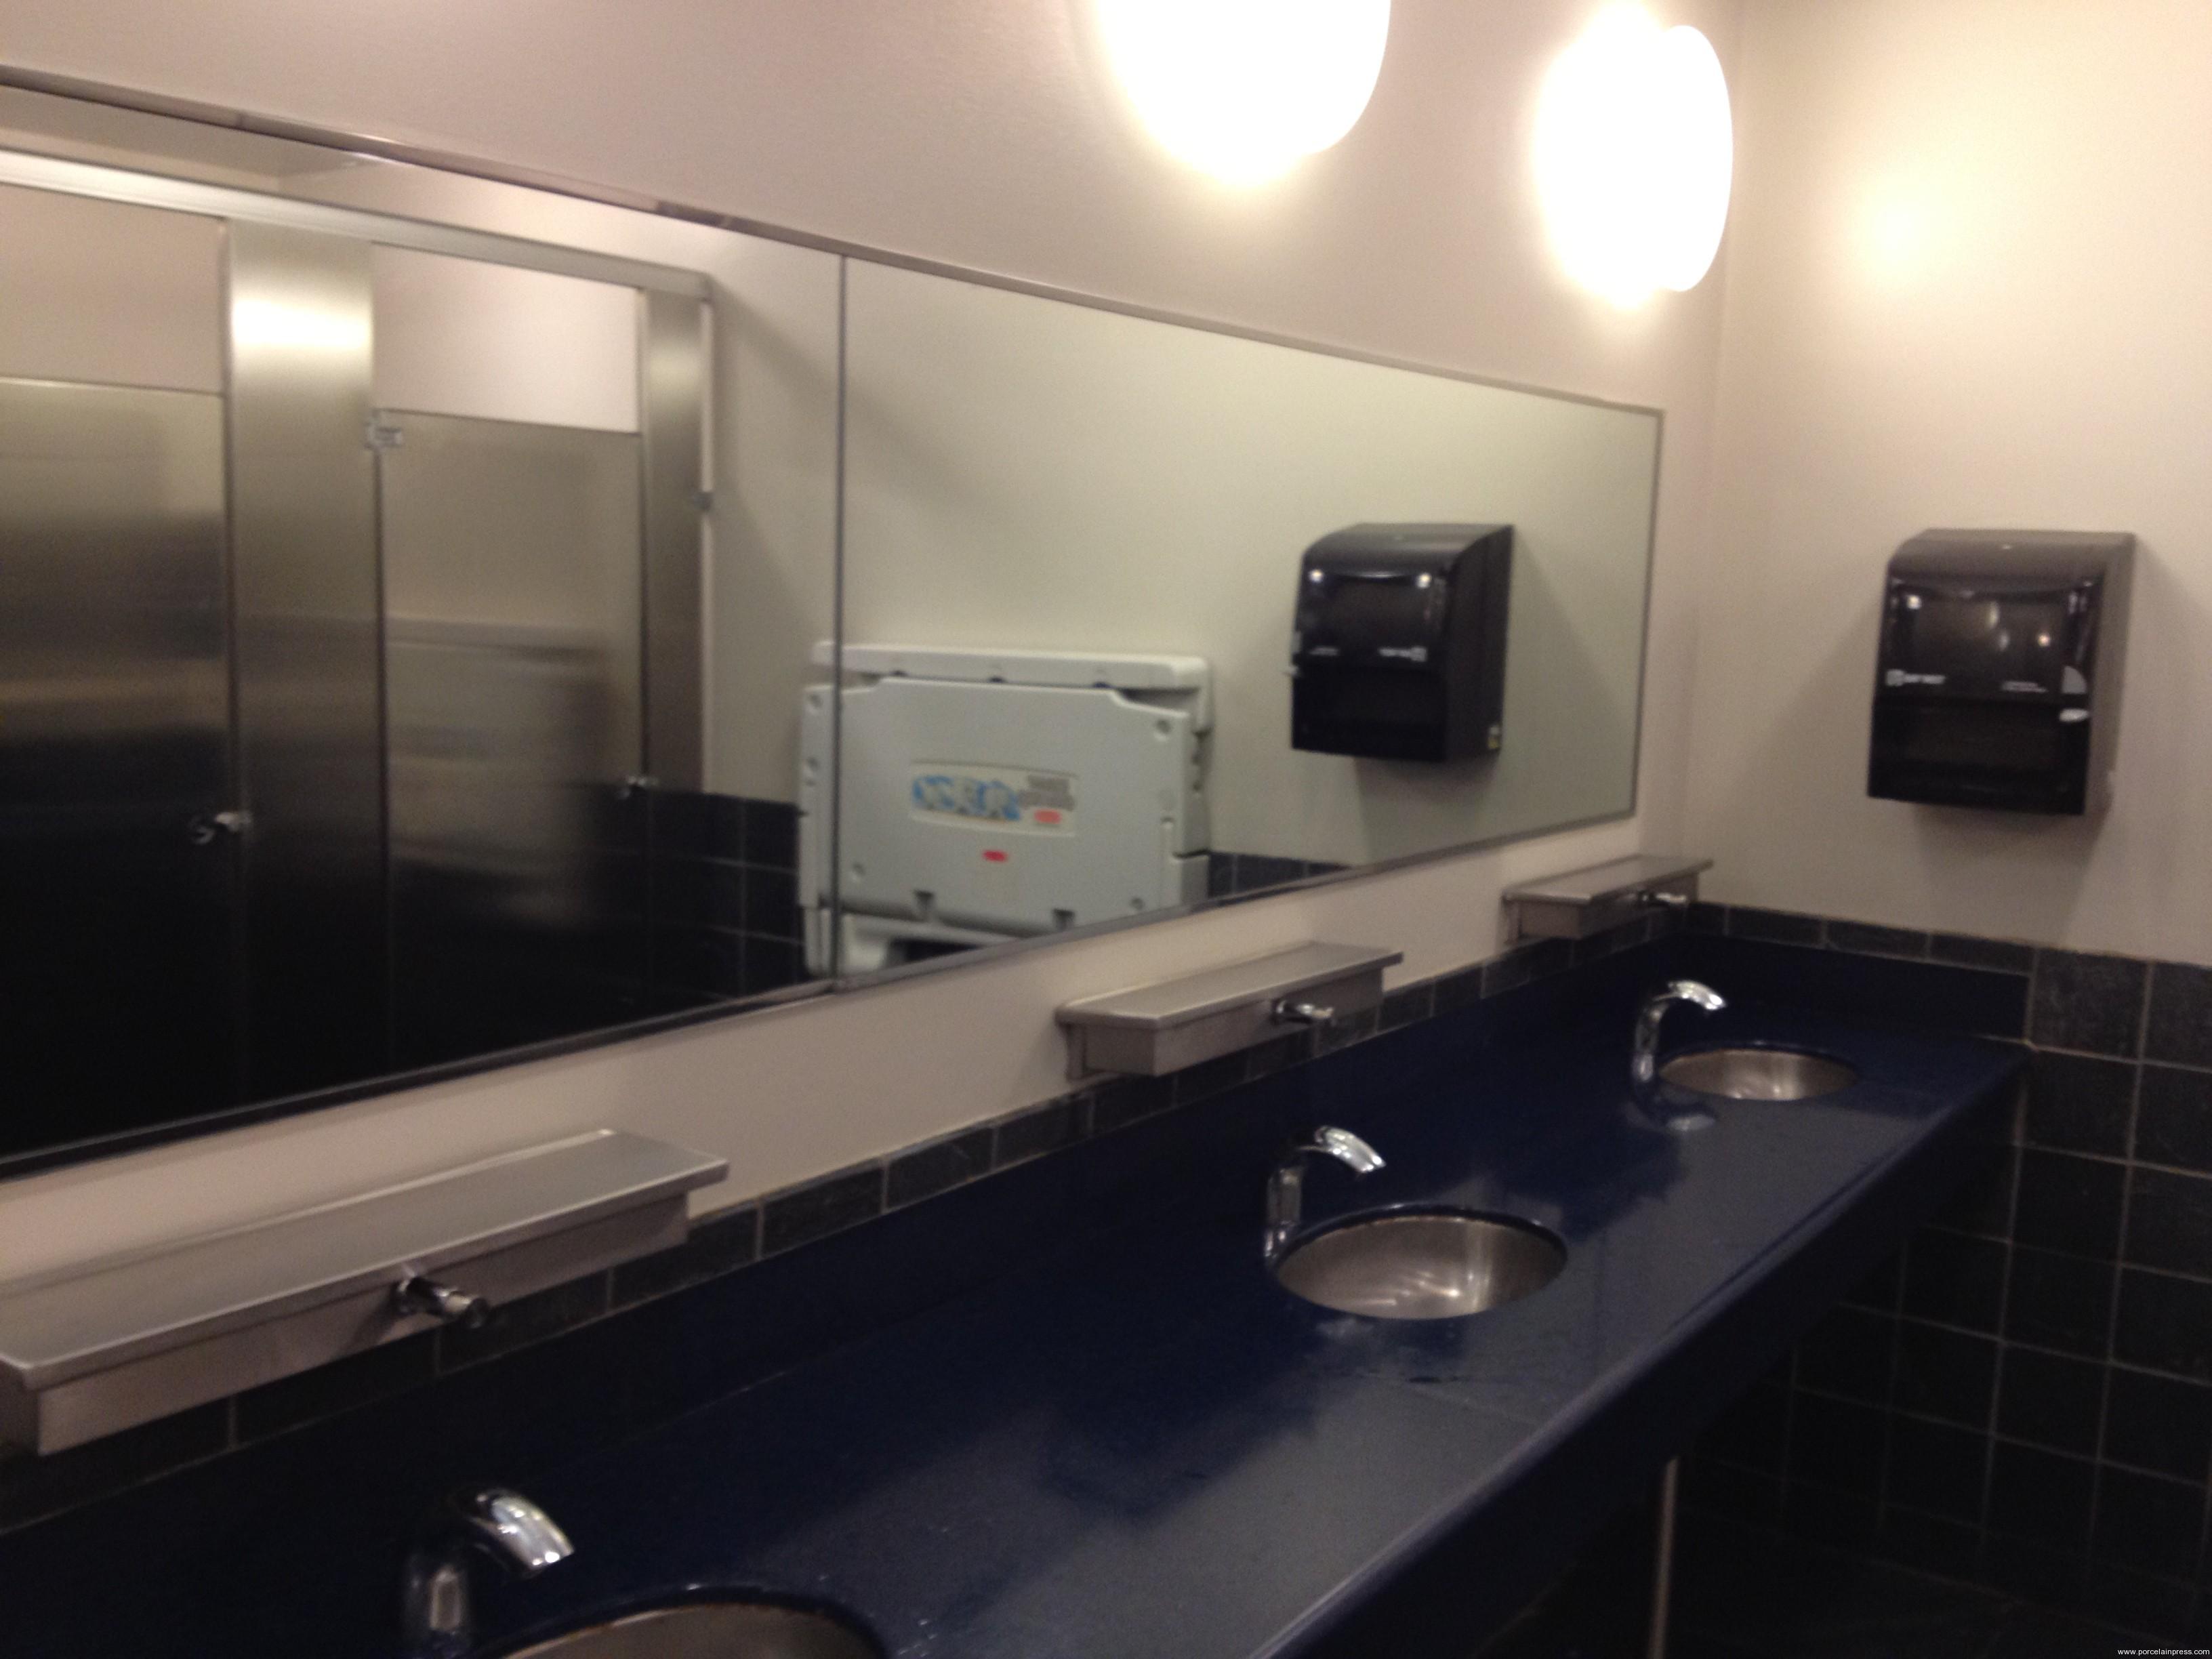 The Cloisters bathroom restroom. Porcelain Press   A topnotch WordPress com site   Page 15